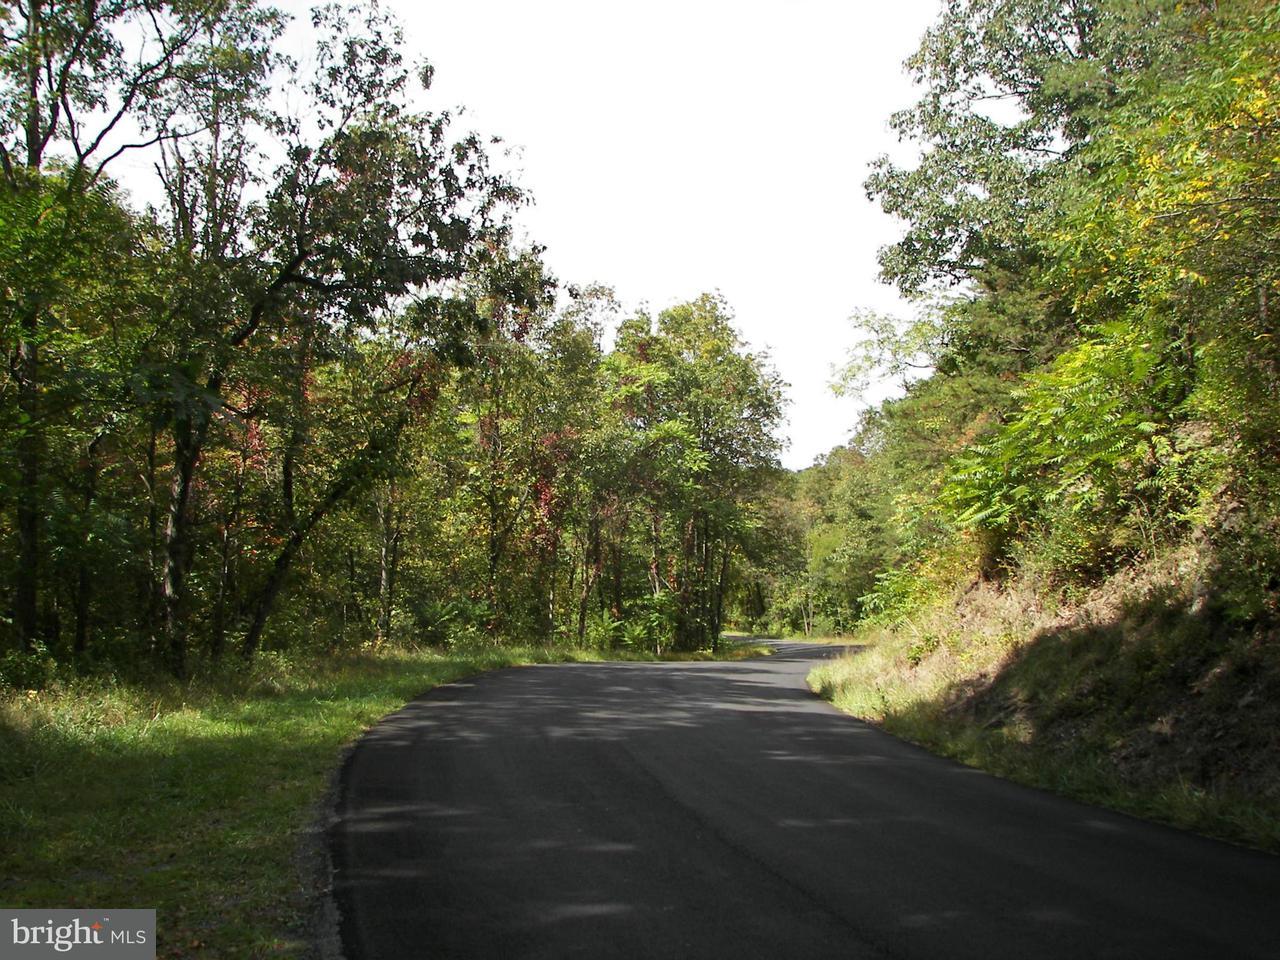 Land for Sale at Mesner Rd Berkeley Springs, West Virginia 25411 United States